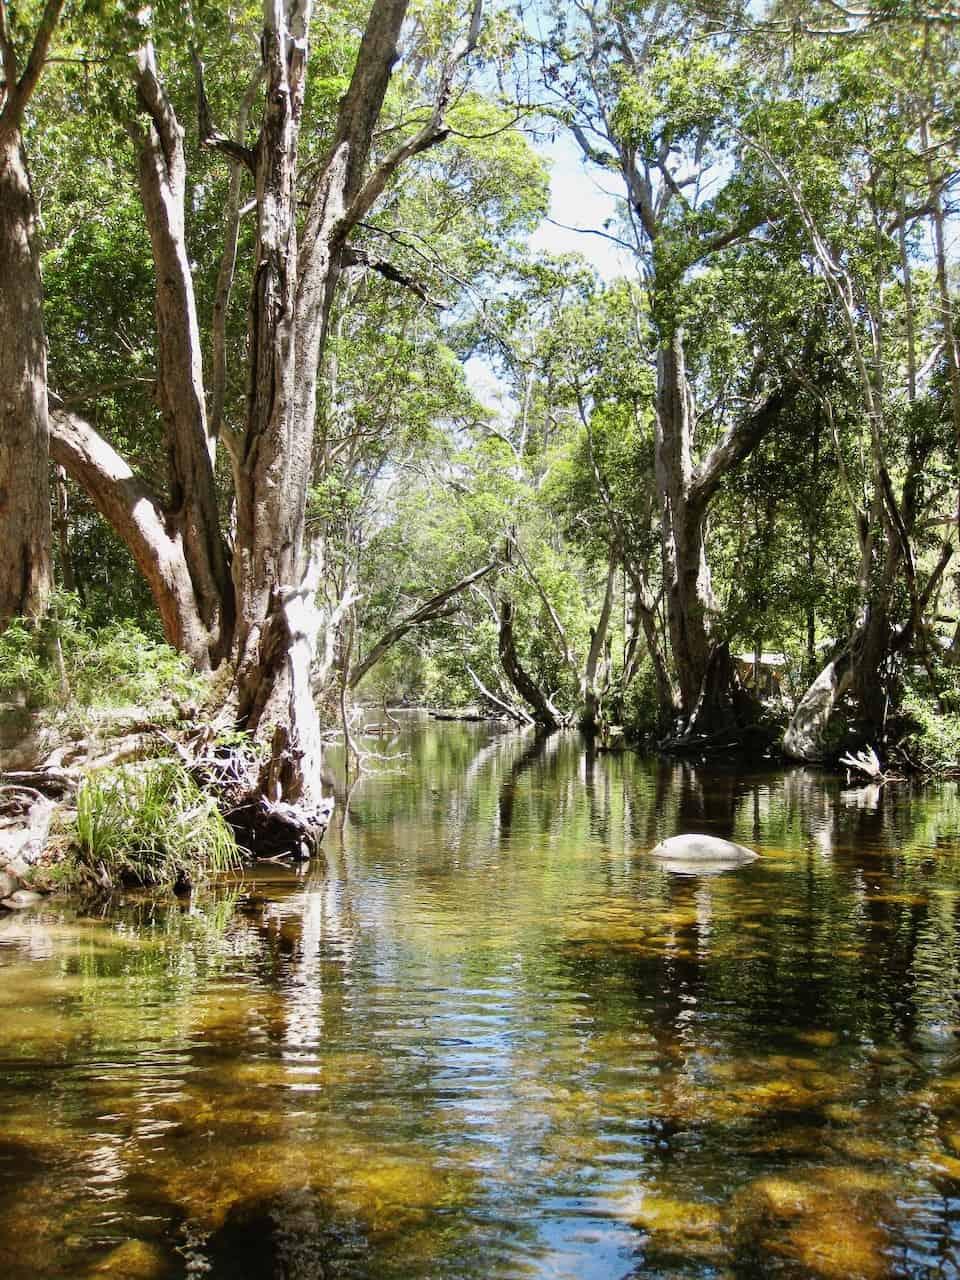 source-mcleod-river-australia-photo